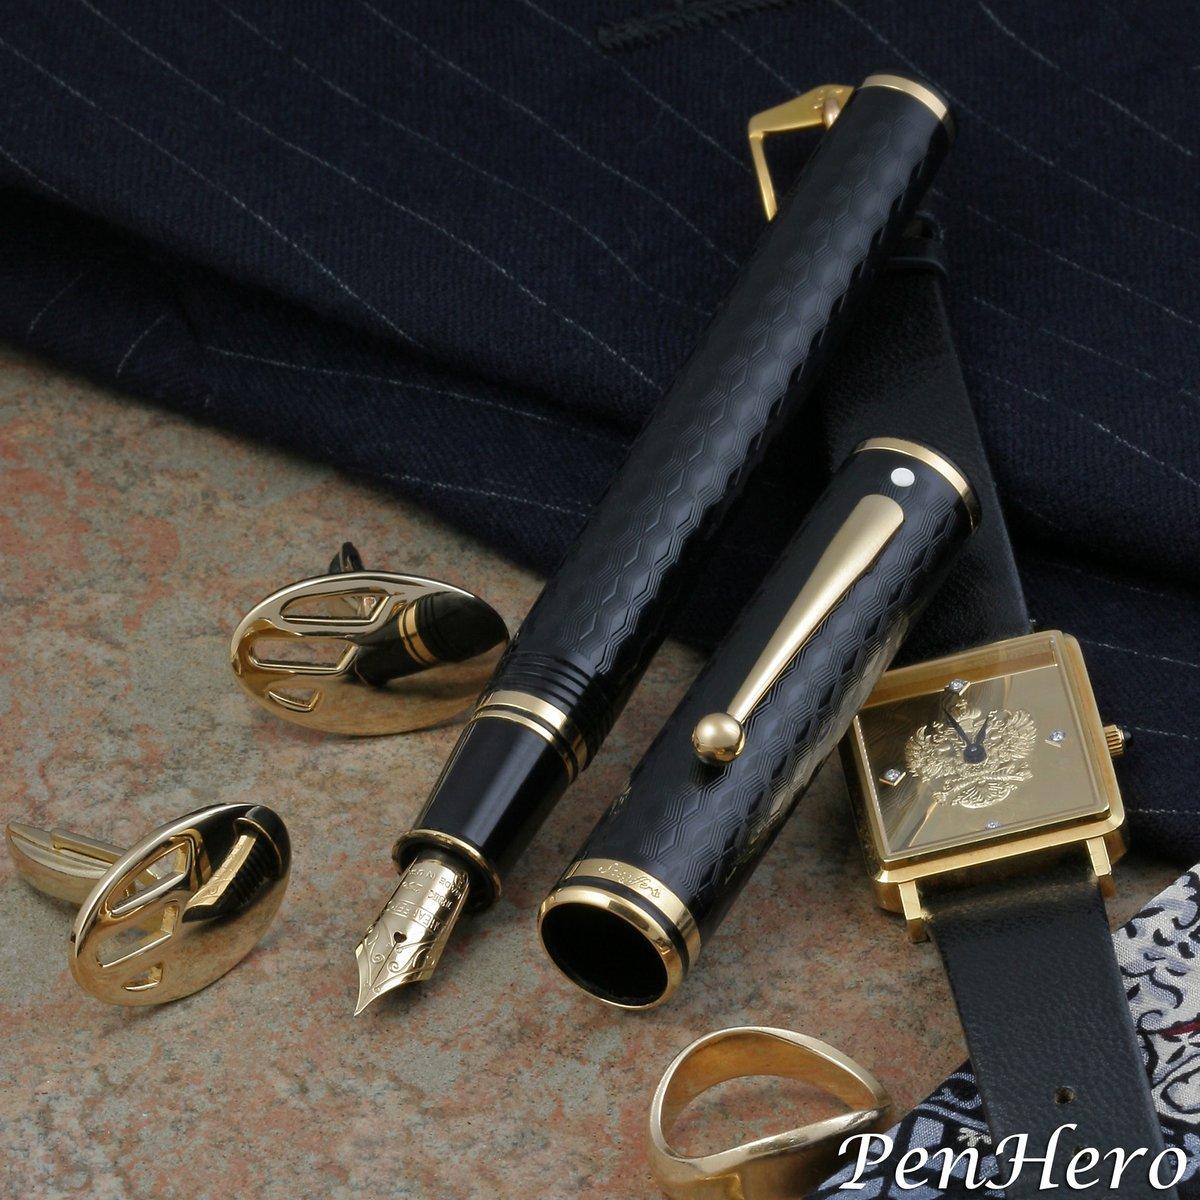 Sheaffer Connaisseur Herringbone fountain pen c. 1991-1992   #pencollecting #fountainpen #sheaffer #sheafferpen  #sheafferconnaisseur  #connaisseur #nononsense #guilloche #herringbone #penhero